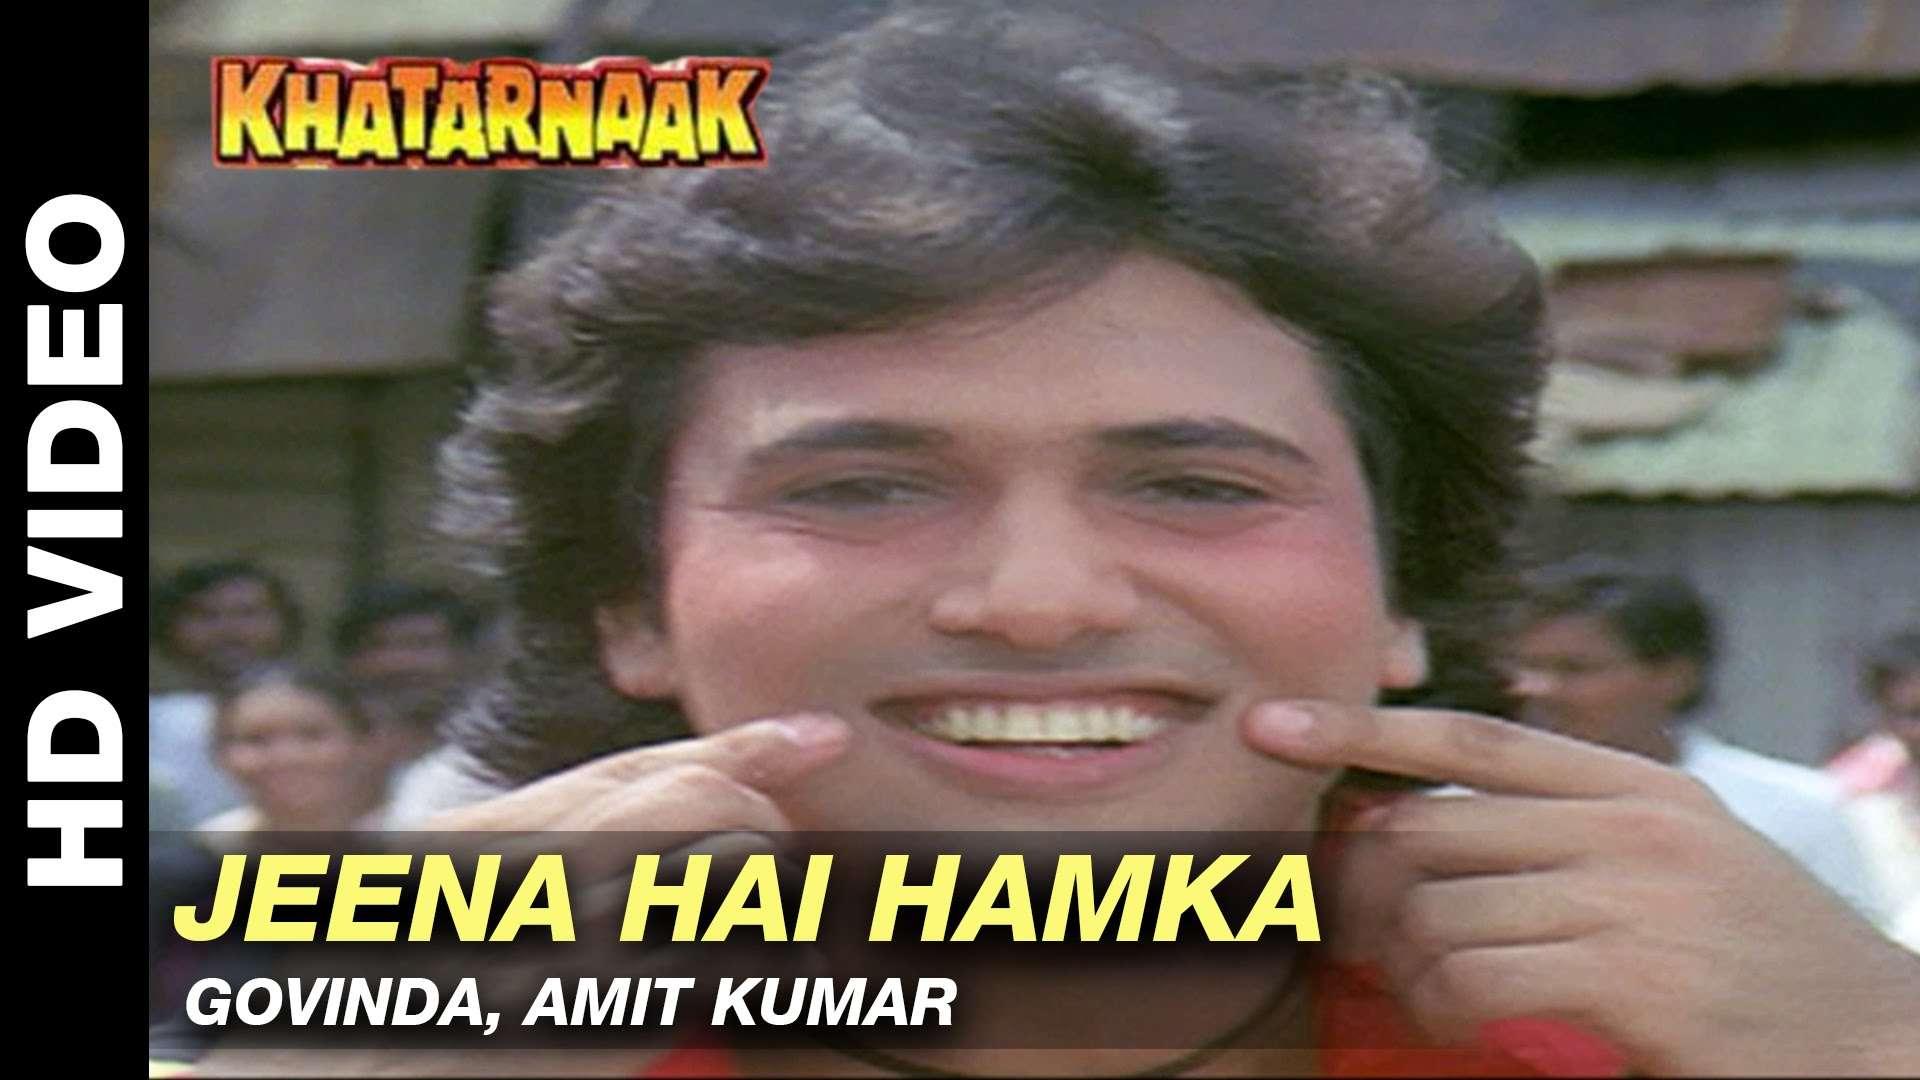 Khatarnaak | Song - Jeena Hai Hamka